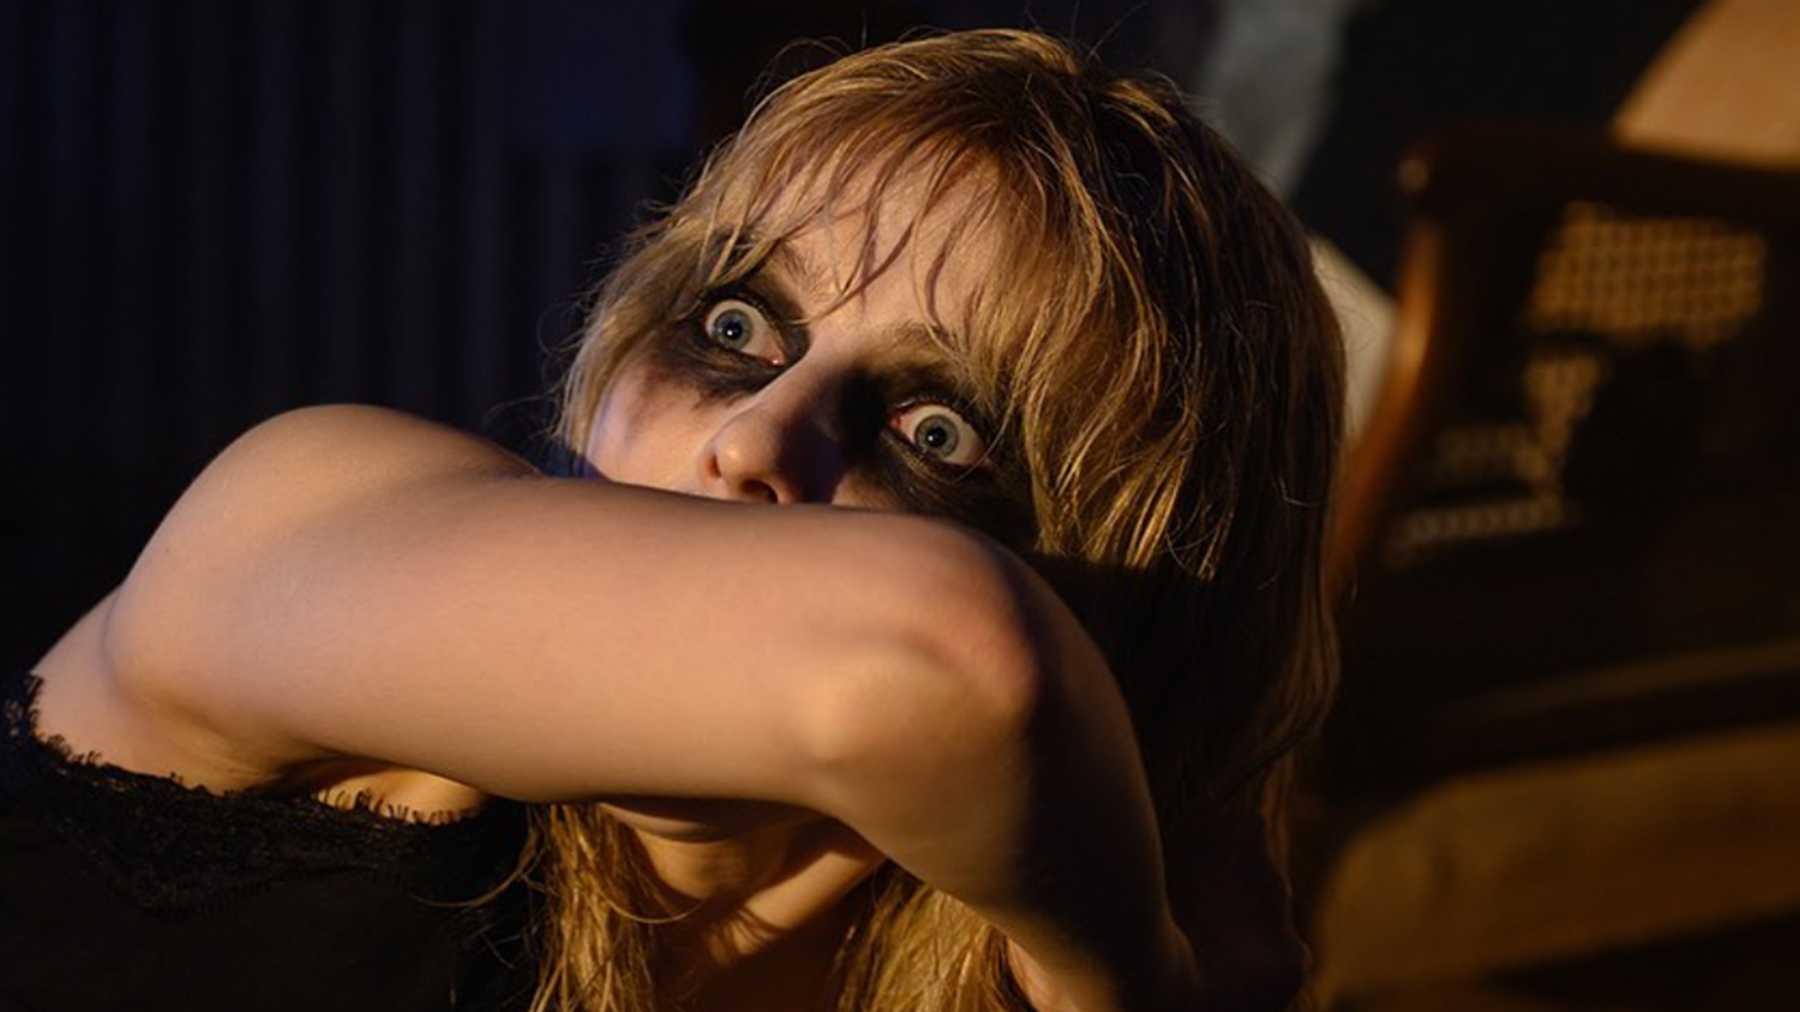 Anya Taylor-Joy Teases Edgar Wright's 'Soho' as Disturbing Acid Trip | IndieWire